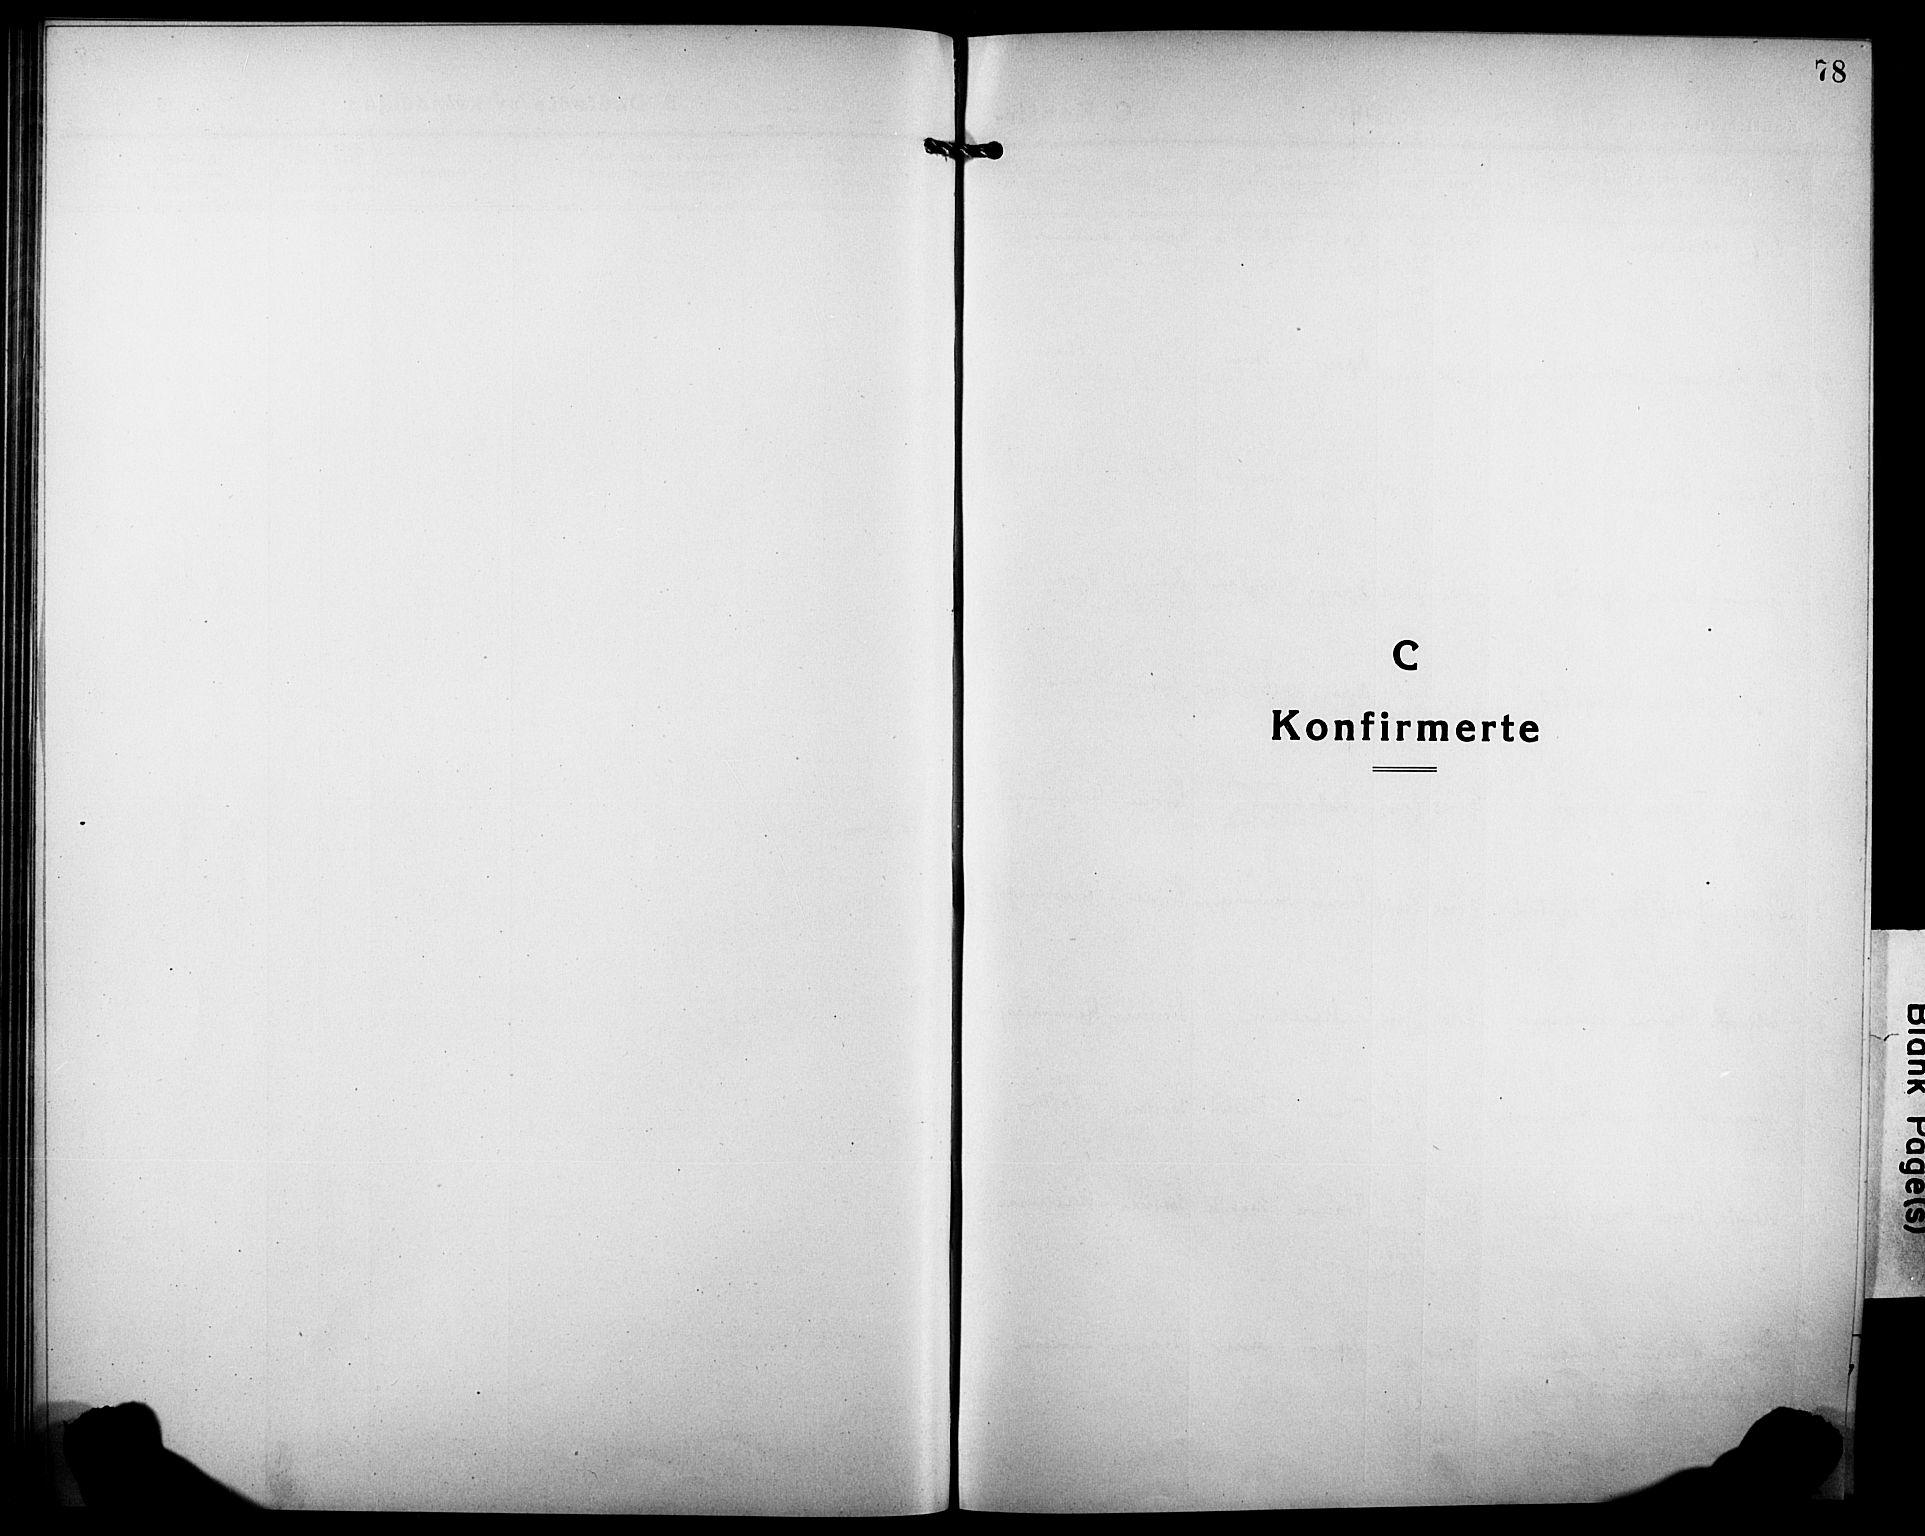 SATØ, Tranøy sokneprestkontor, I/Ia/Iab/L0006klokker: Klokkerbok nr. 6, 1919-1932, s. 78